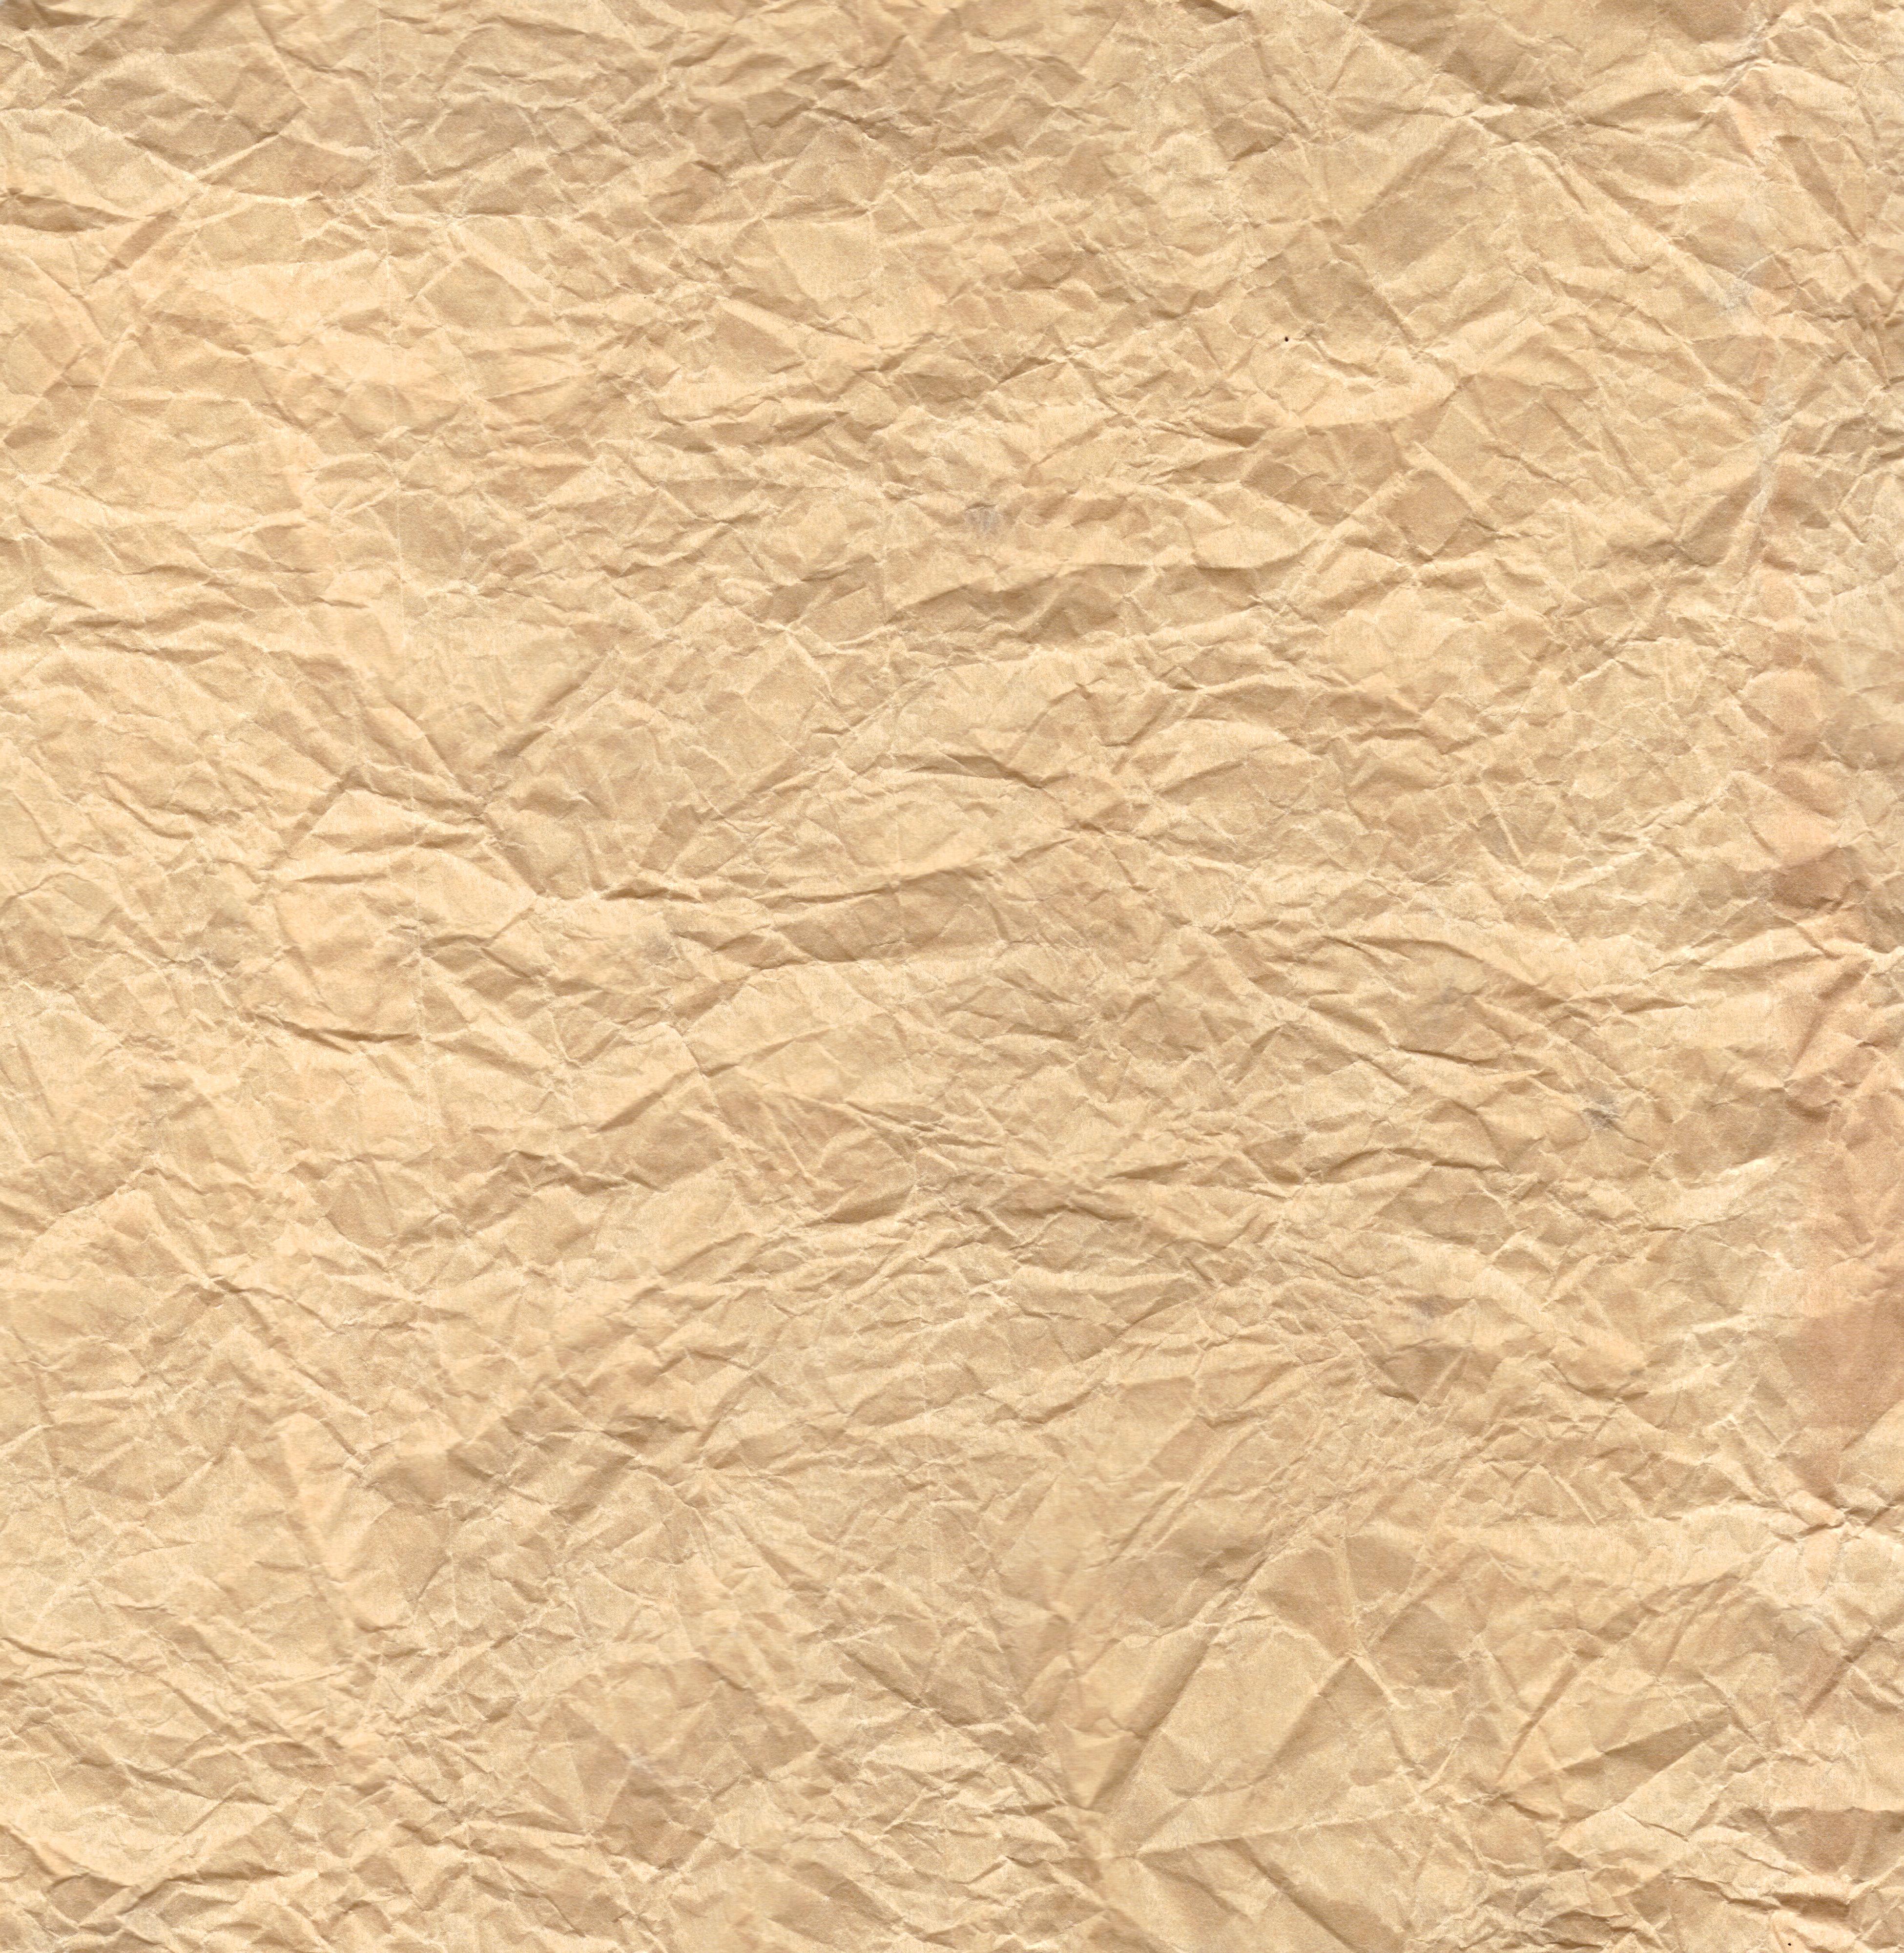 brown wrinkled paper texture (jpg) | onlygfx